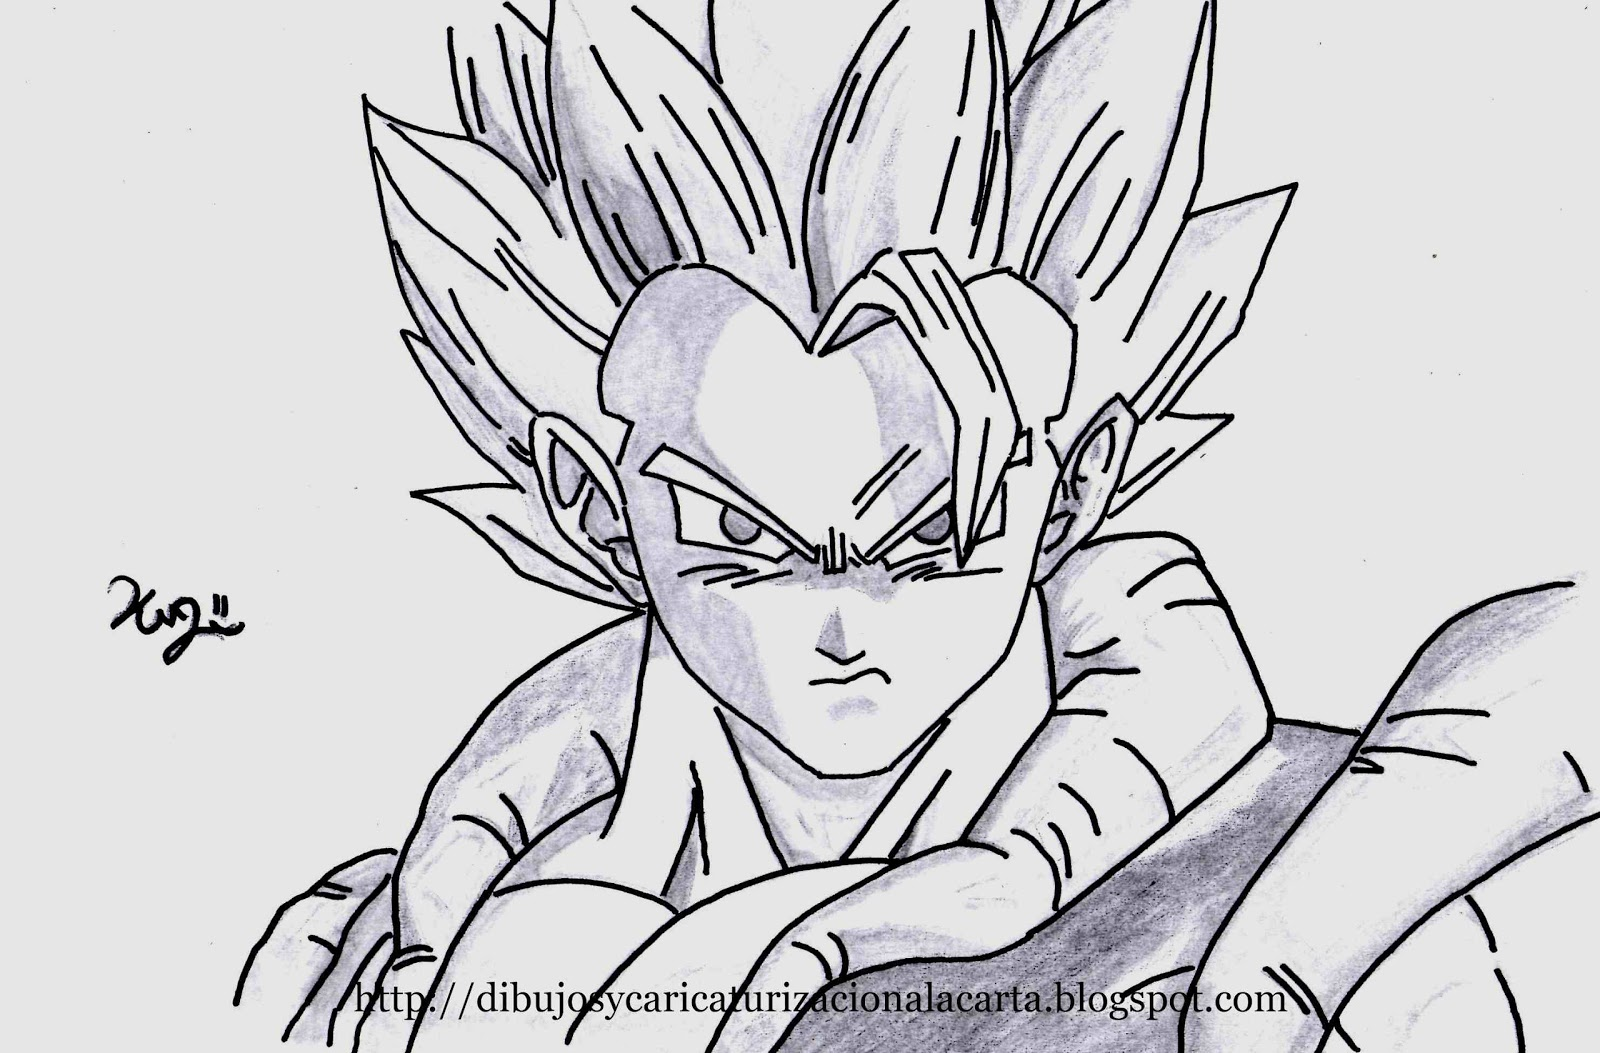 Goku en dibujos a lápiz - Imagui